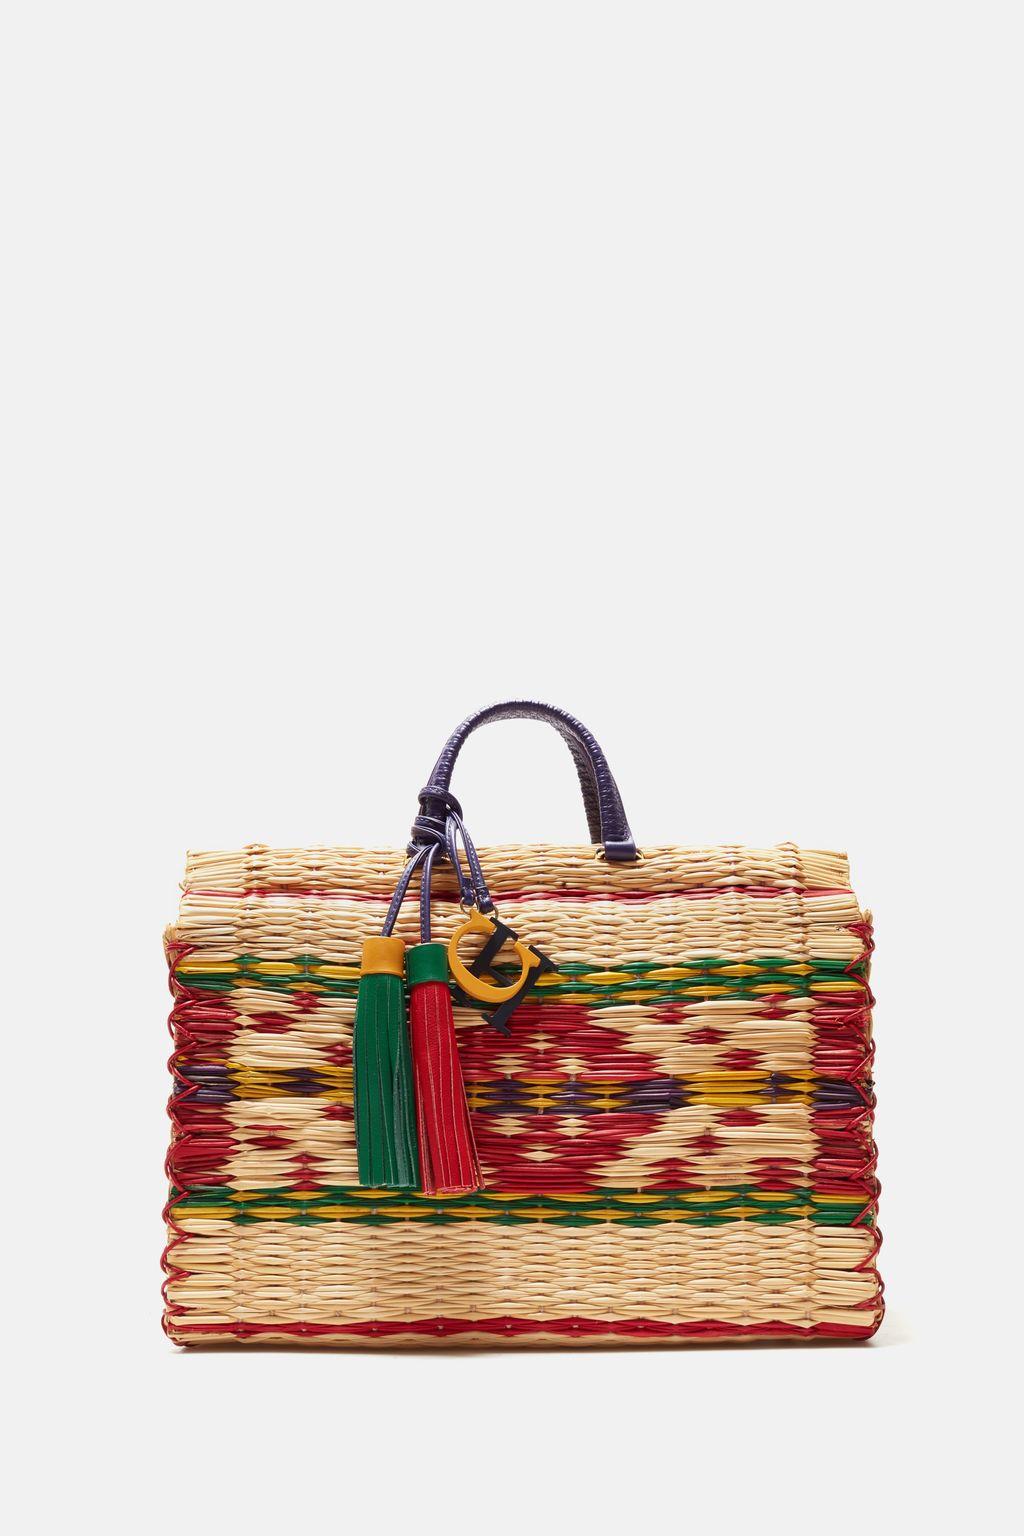 Aveiro | Medium handbag